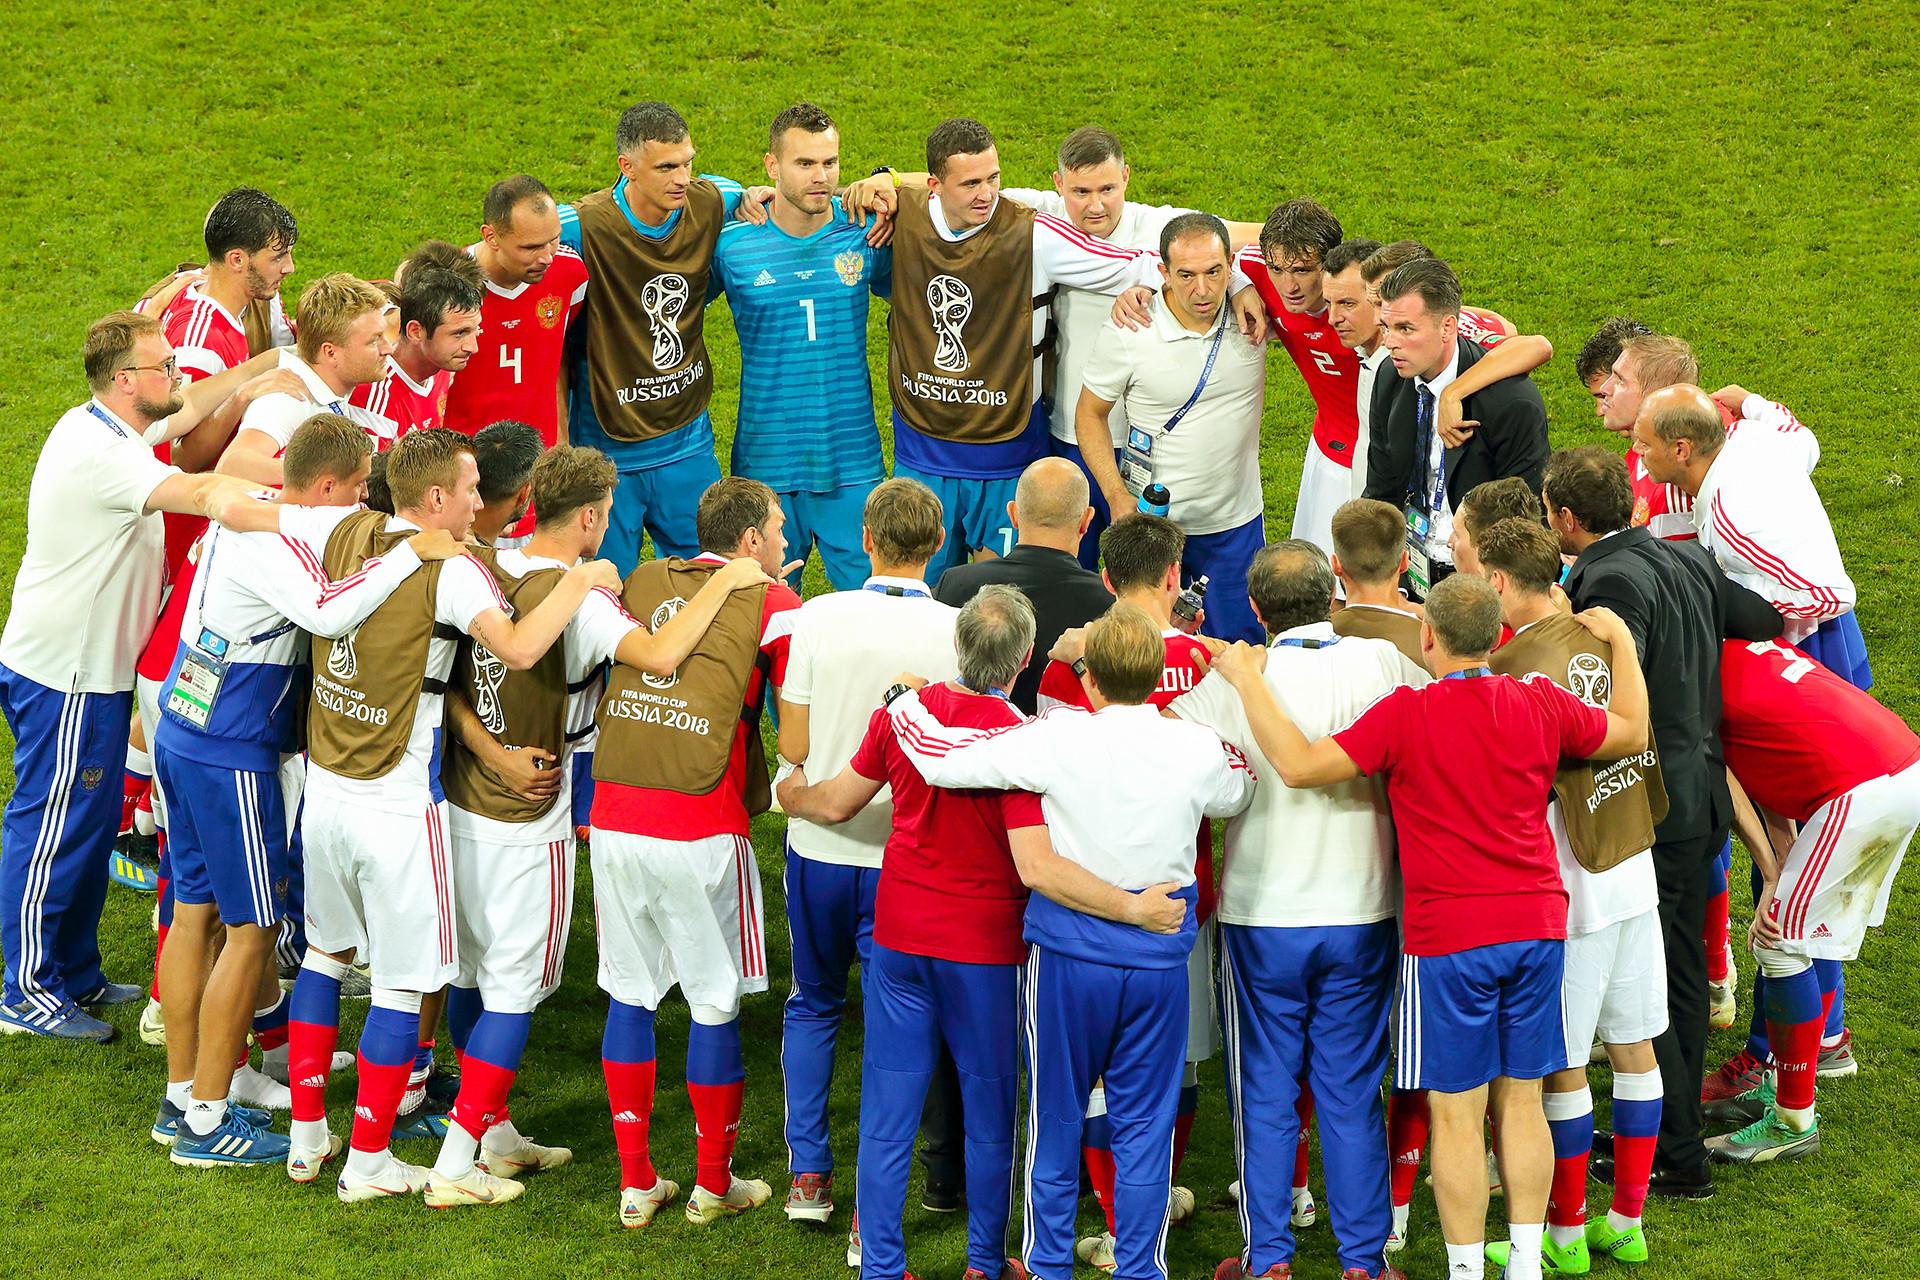 Tim Rusia sebelum seri penalti dengan Kroasia. Mereka kalah tetapi tetap menjadi pahlawan bagi semua penggemar sepak bola Rusia.